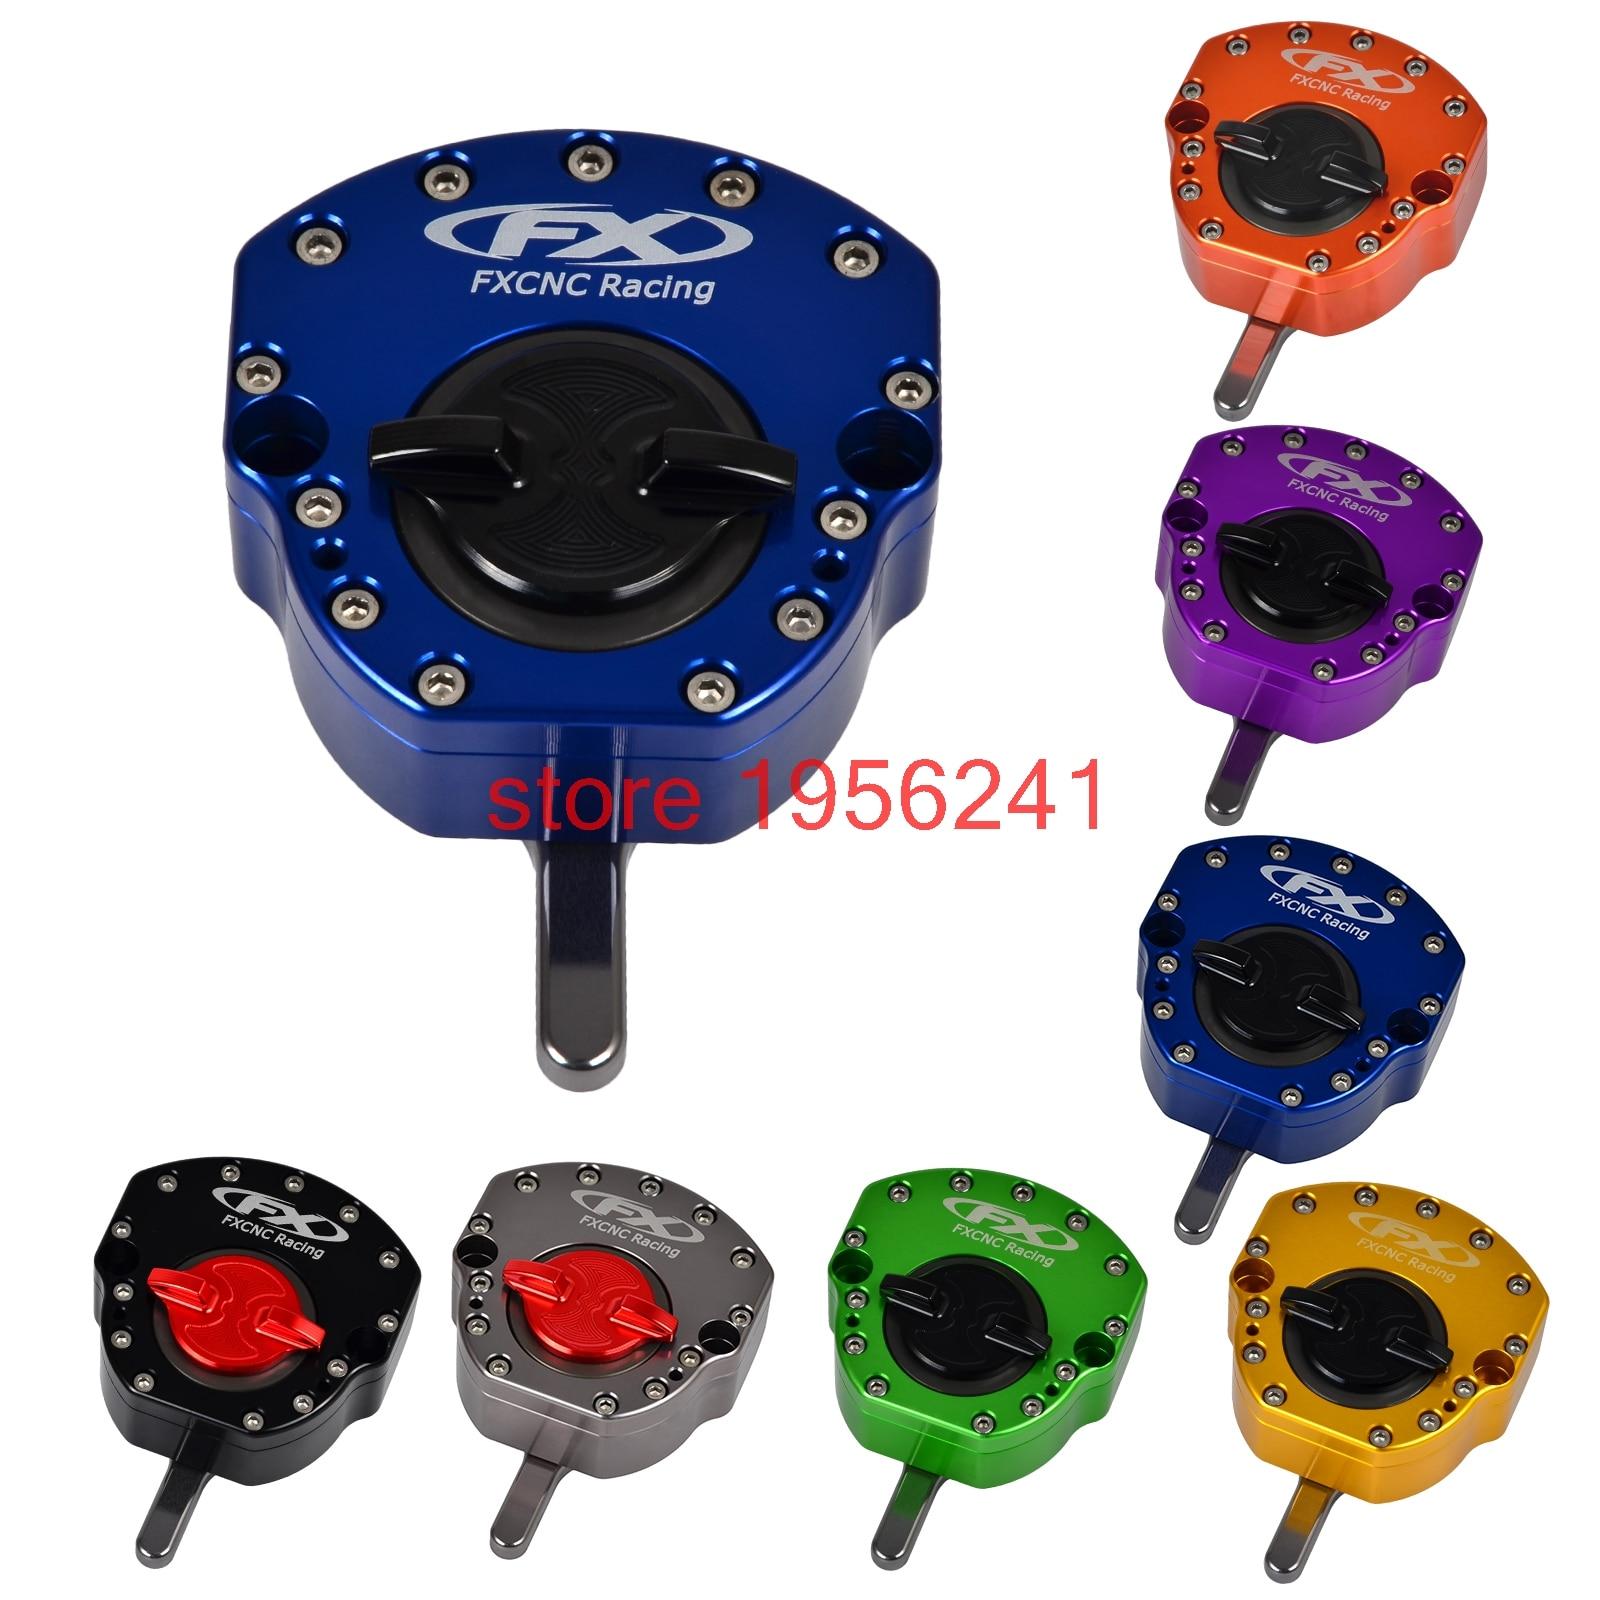 CNC Steering Stabilizer Damper For Kawasaki EX250R Ninja 08-12 EX300R 13-15 ZX636 13-14 ZX6R ZX-6R 07-12 ZX10R ZX-10R 04-13 cnc steering stabilizer damper for kawasaki ex250r ninja 08 12 ex300r 13 15 zx636 13 14 zx6r zx 6r 07 12 zx10r zx 10r 04 13